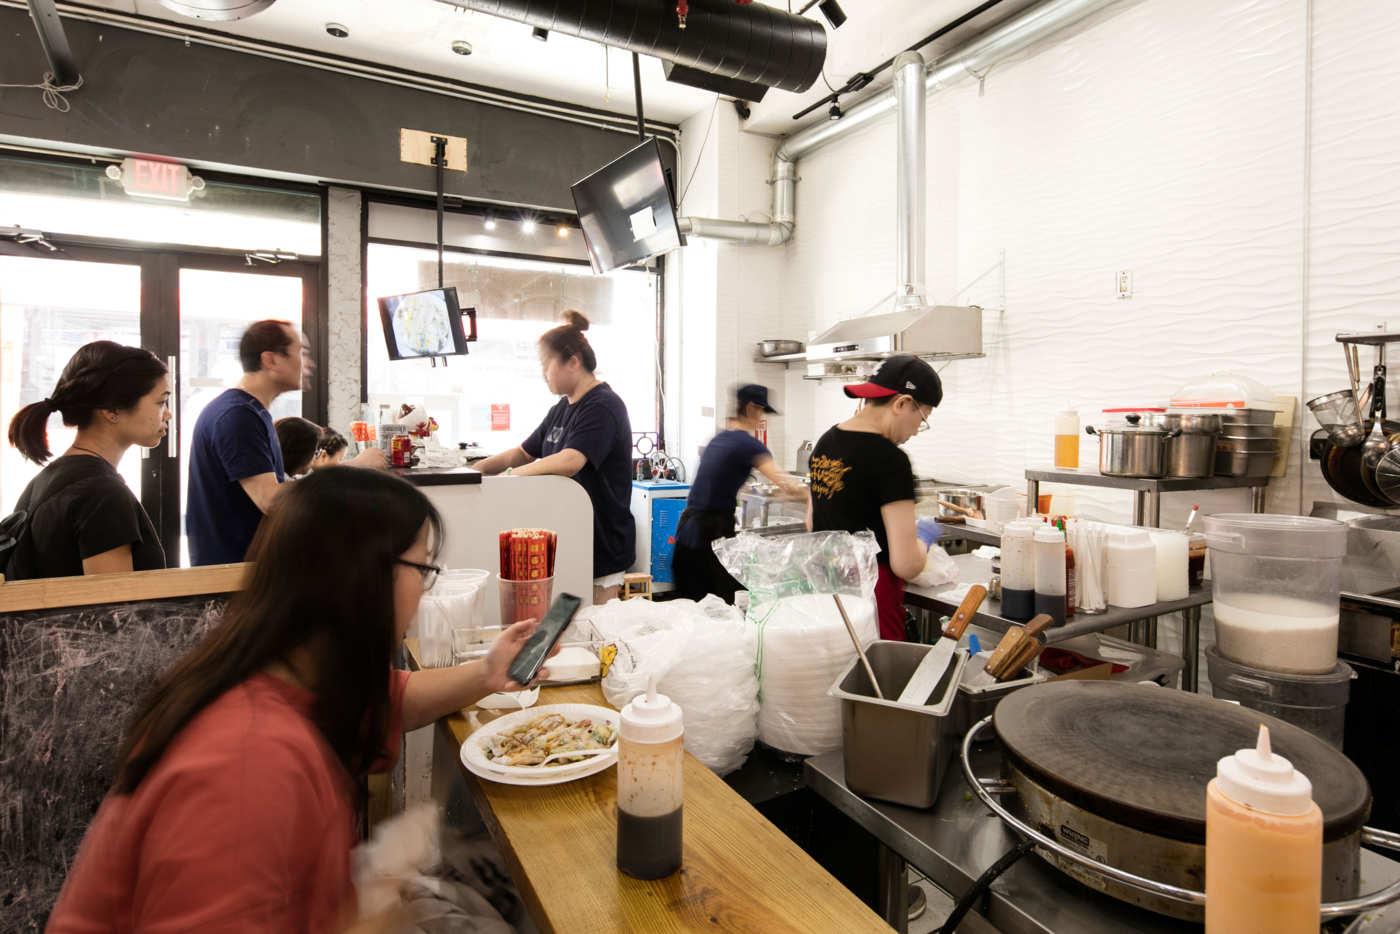 Pleasing The Absolute Best Chinese Restaurants In Flushing Nyc Download Free Architecture Designs Intelgarnamadebymaigaardcom